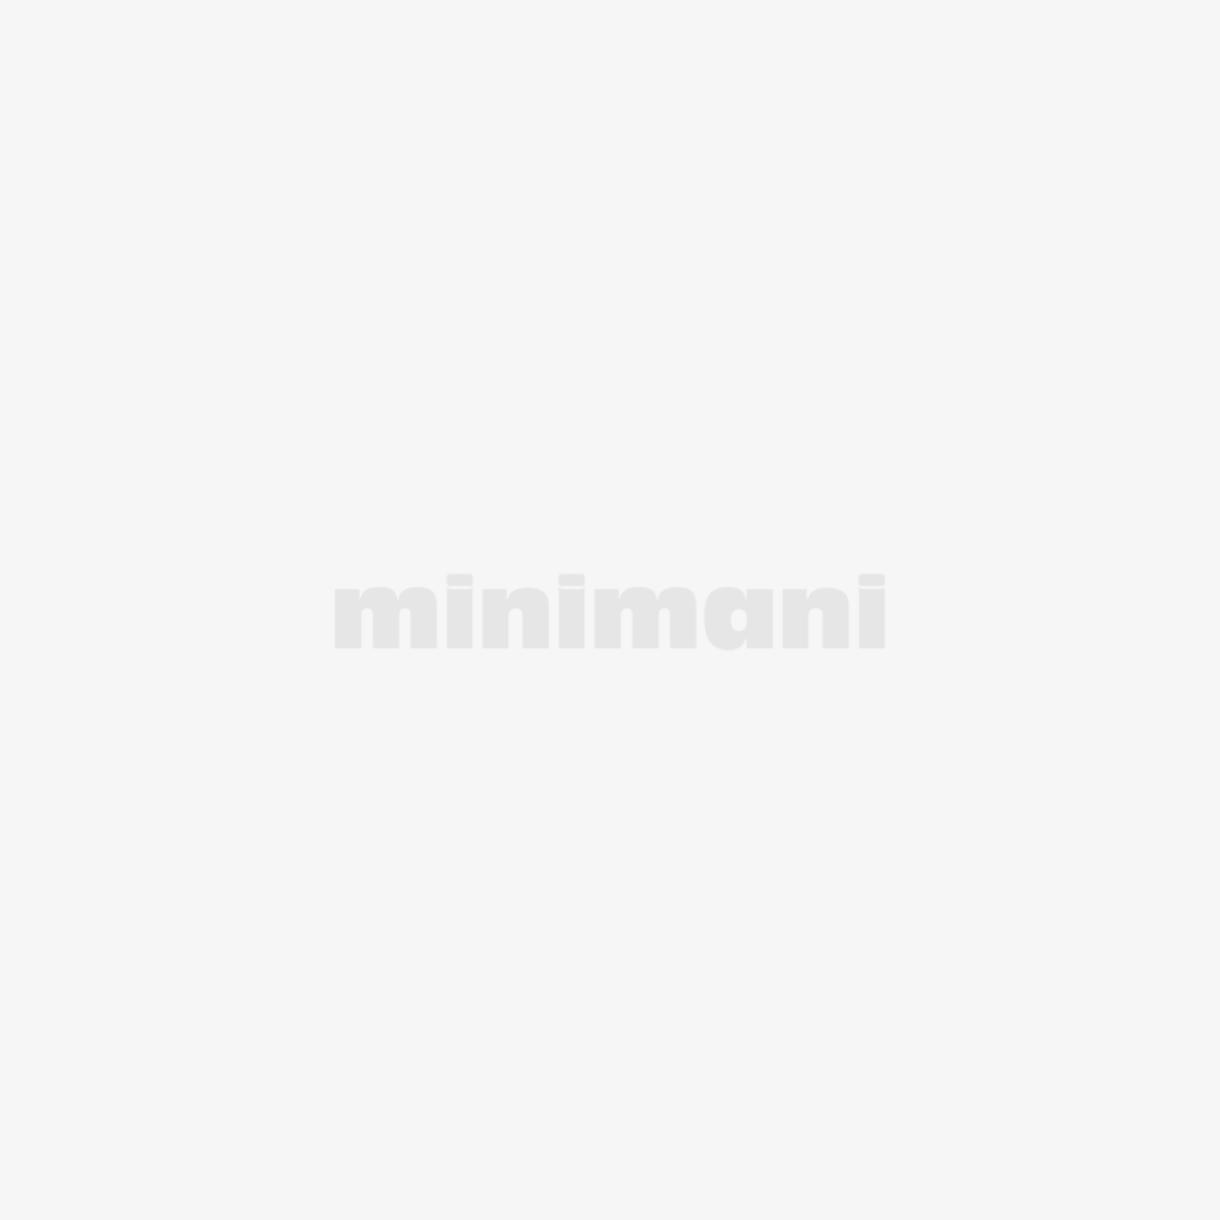 STANLEY STANLEY LUMILINKO  S-ST 163cc (56 cm)